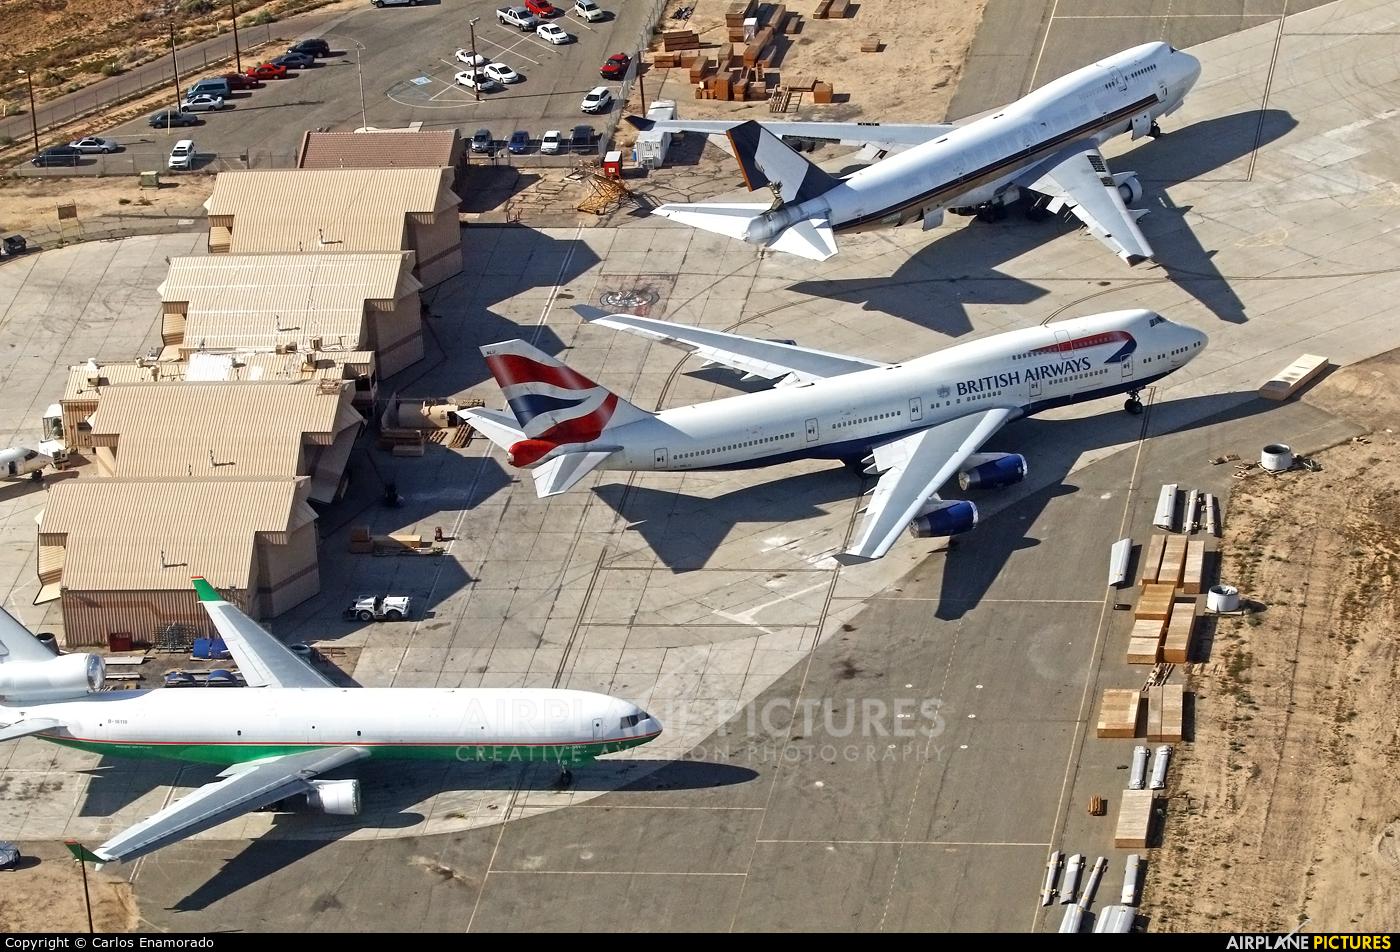 British Airways G-BNLU aircraft at Victorville - Southern California Logistics